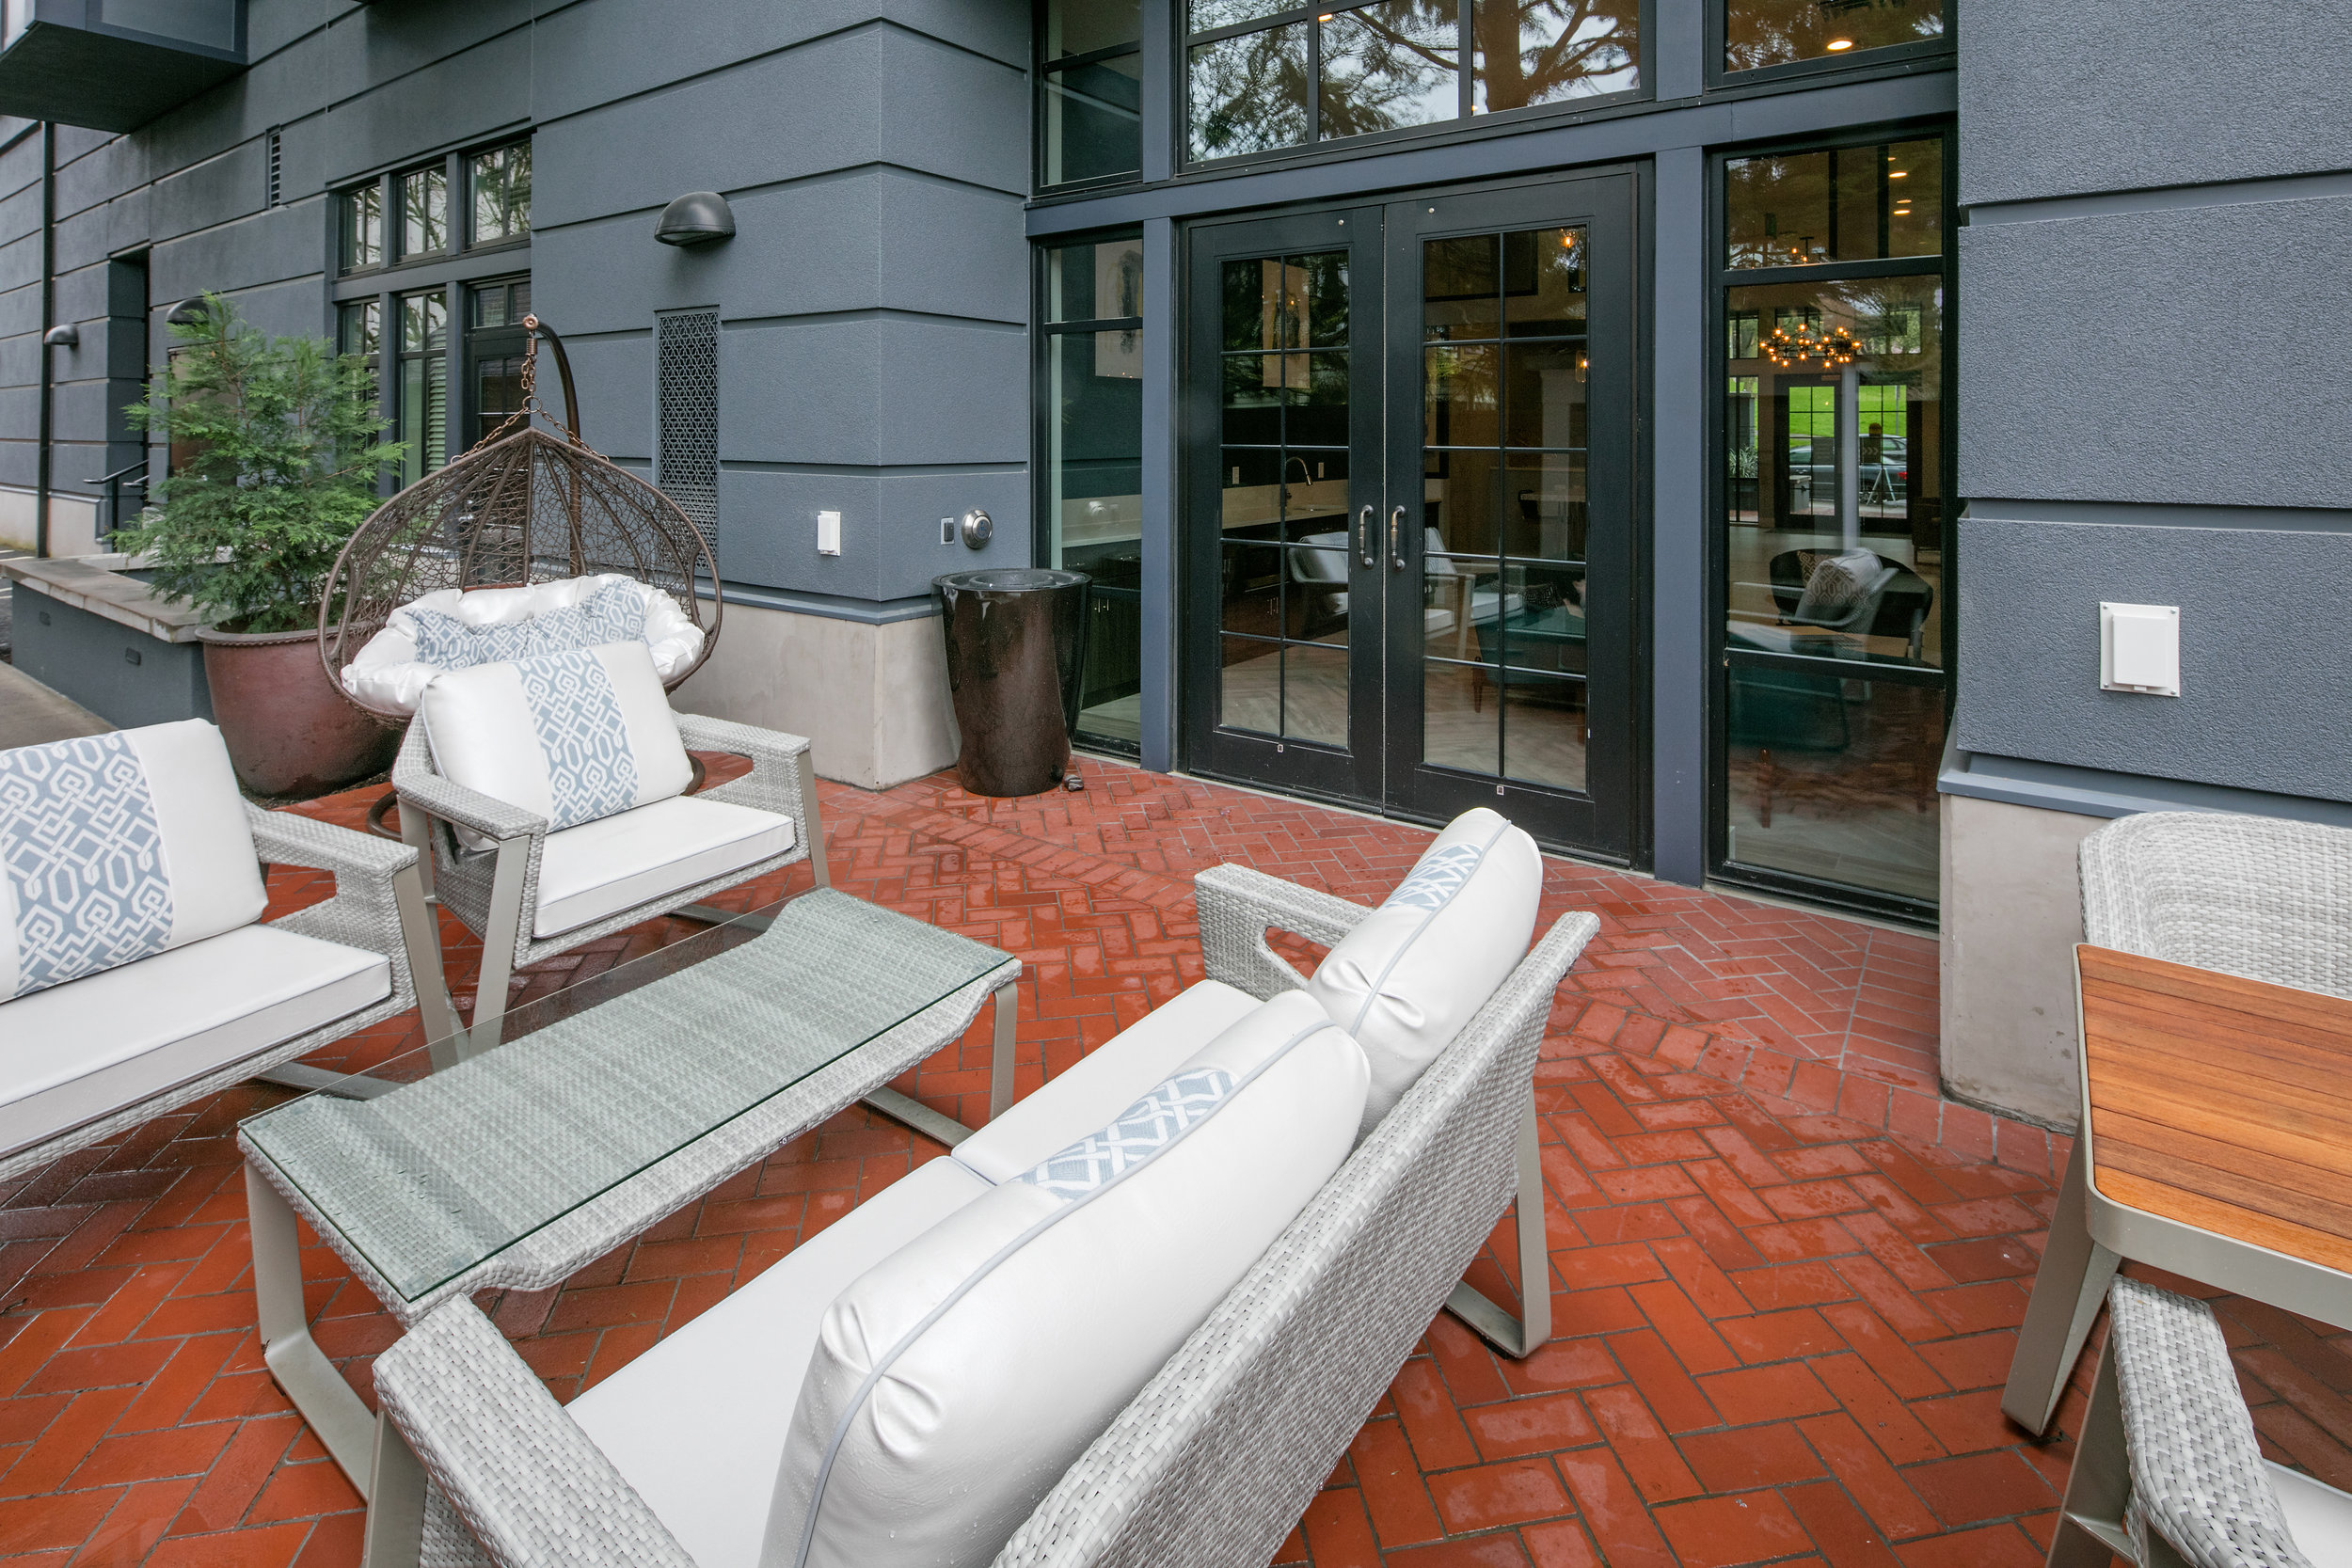 patio4-after_G7A0405RGB.jpg